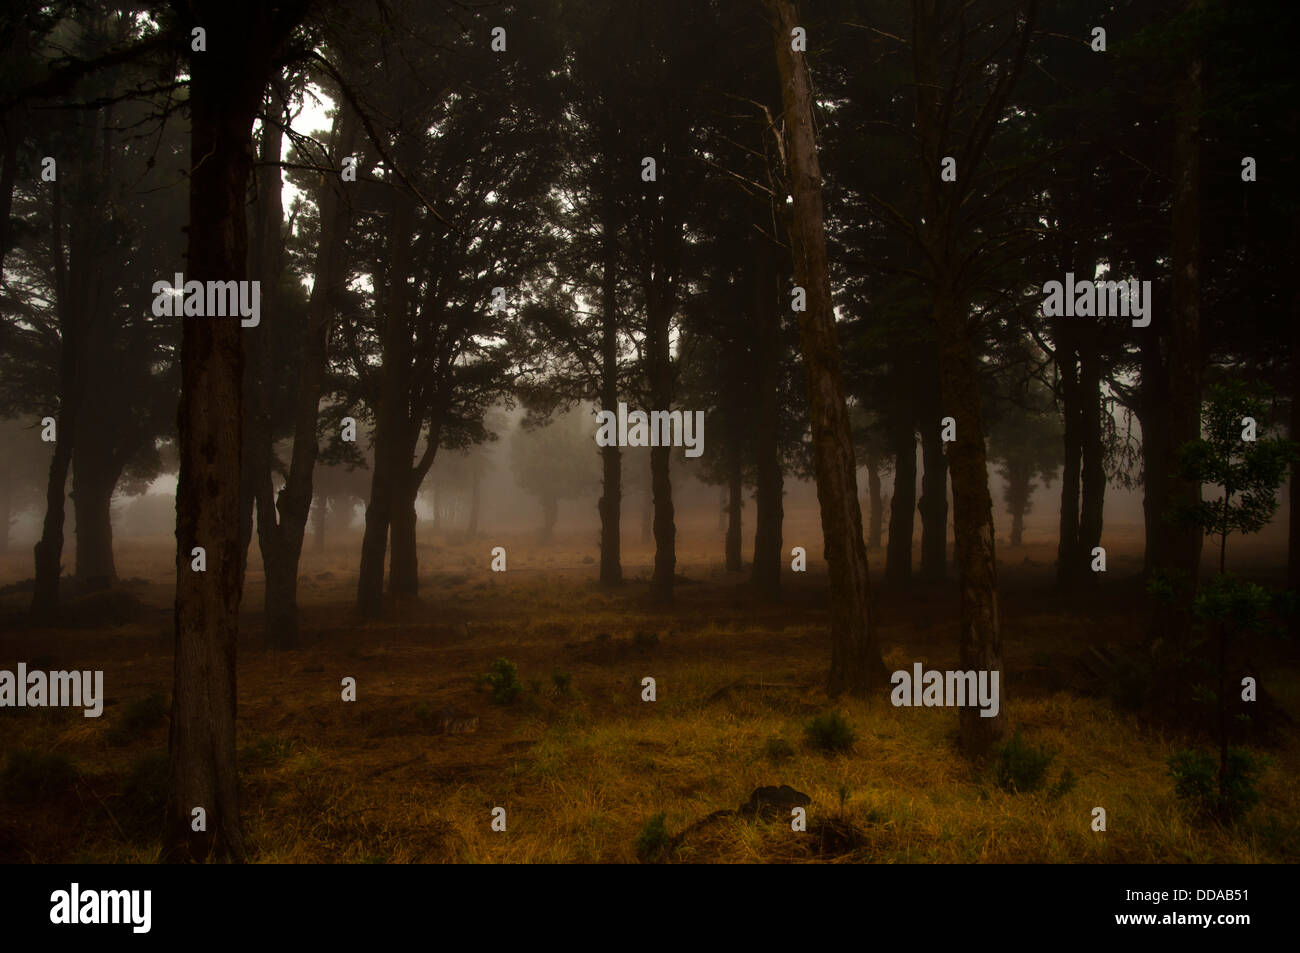 Laurel forest in fog, El Hierro, Canary Islands, Spain, Europe Stock Photo